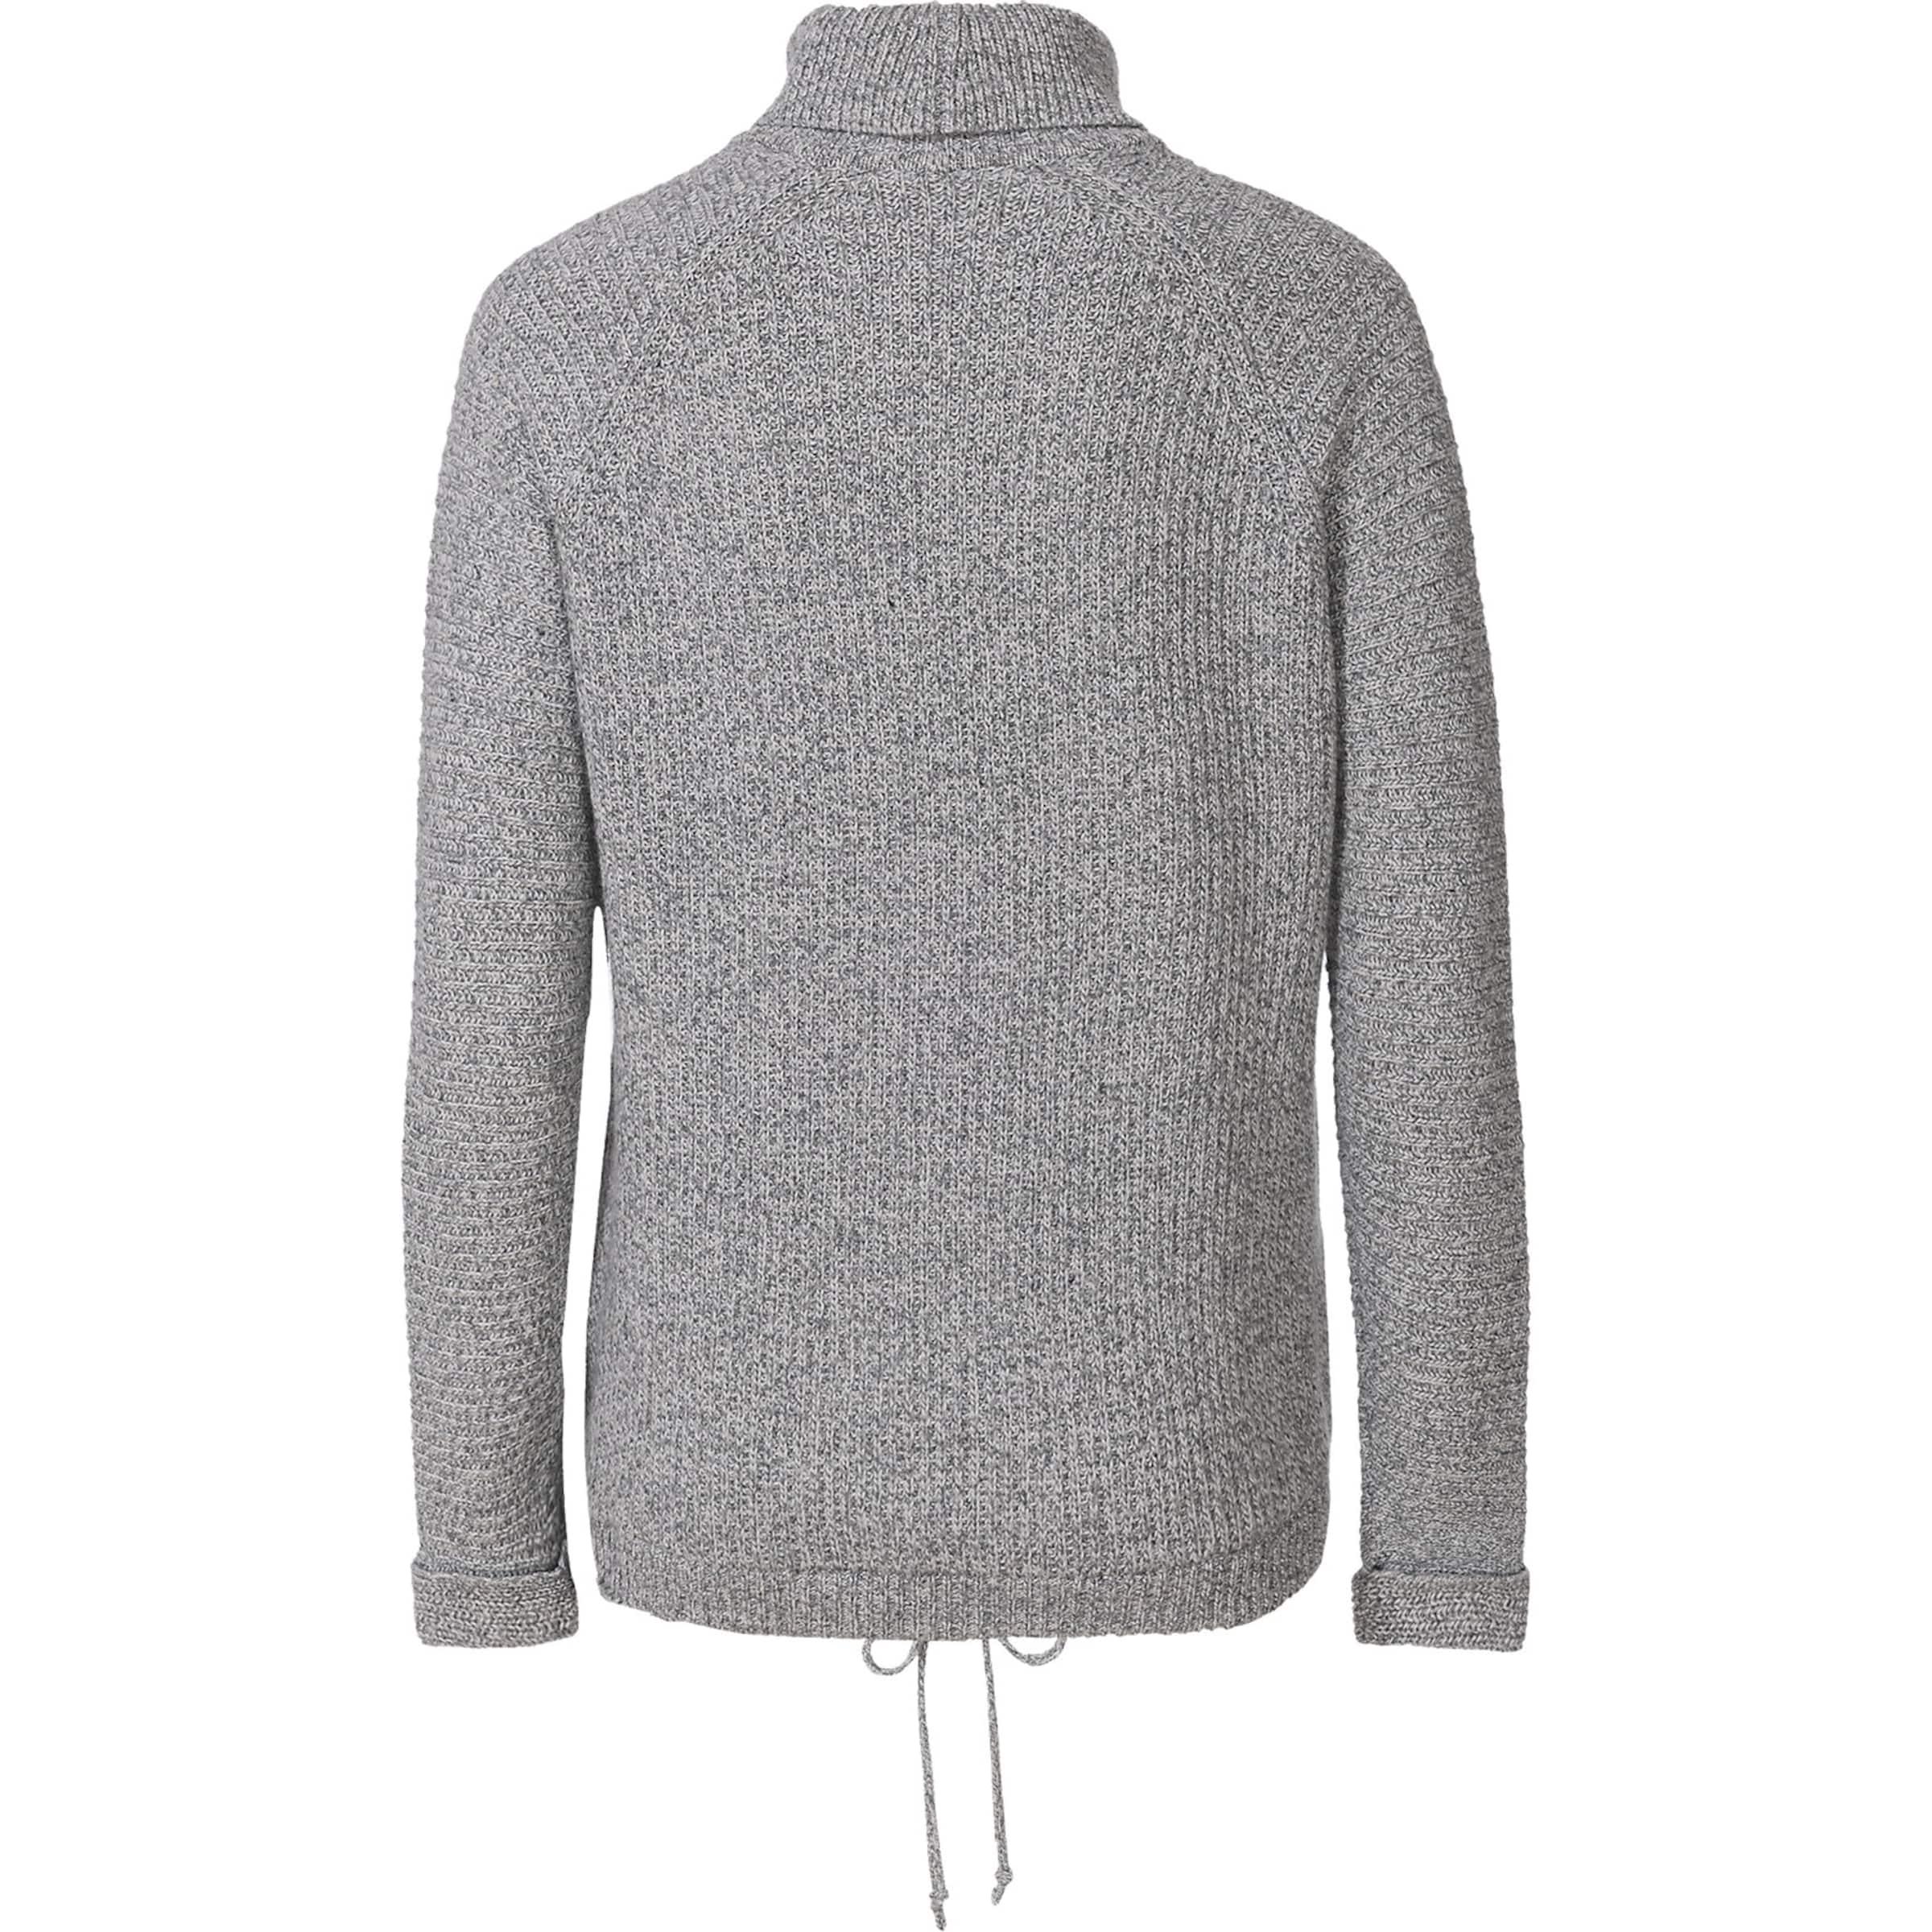 Graumeliert Label In S Pullover oliver Red mn0v8wNOyP